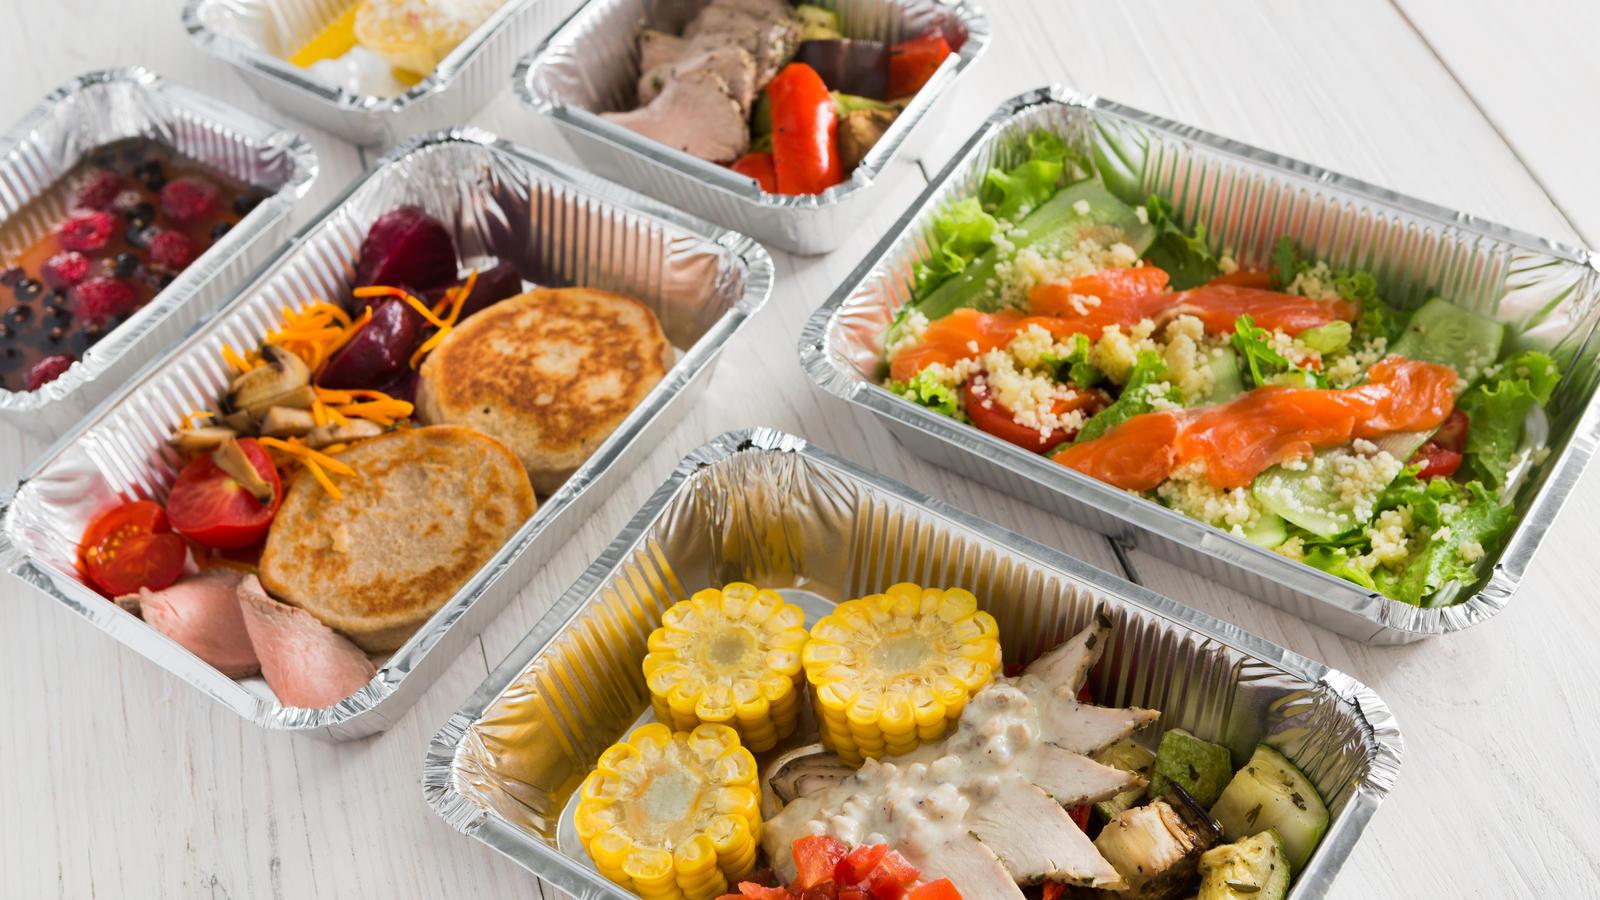 Lebensmittel in Aluminium-Schale.